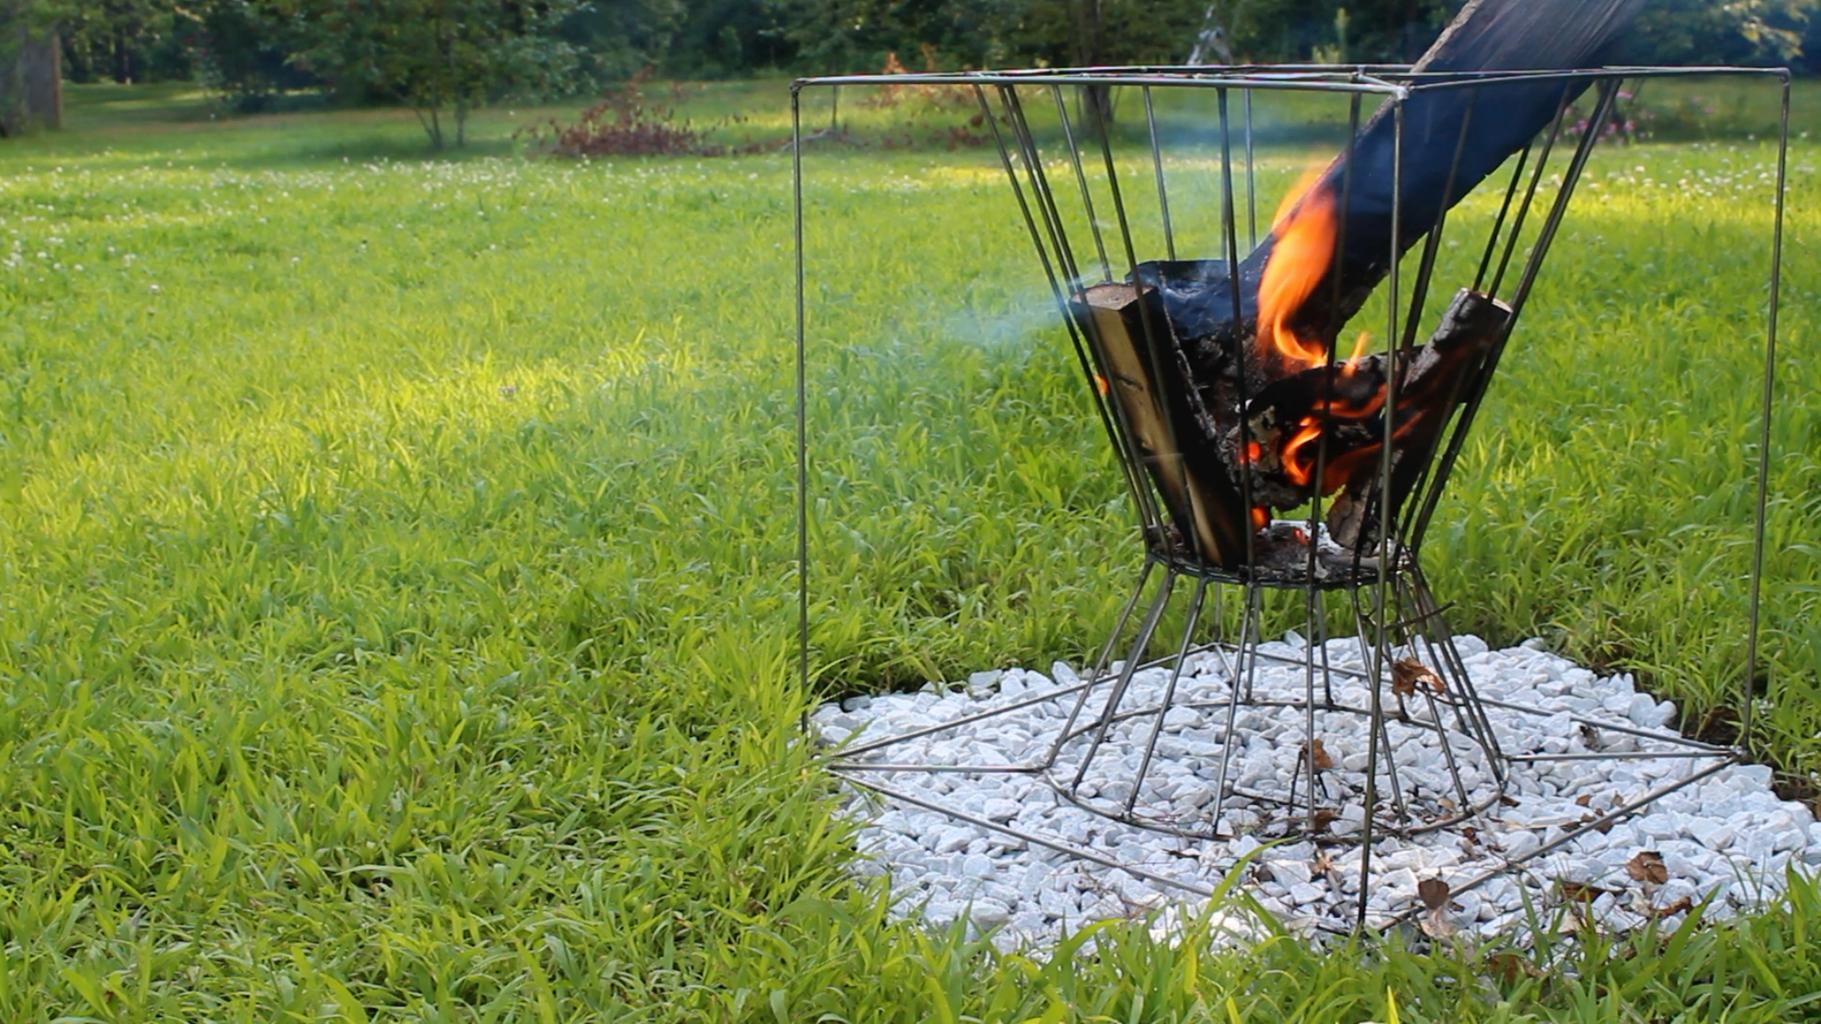 Fire Basket: Complete!